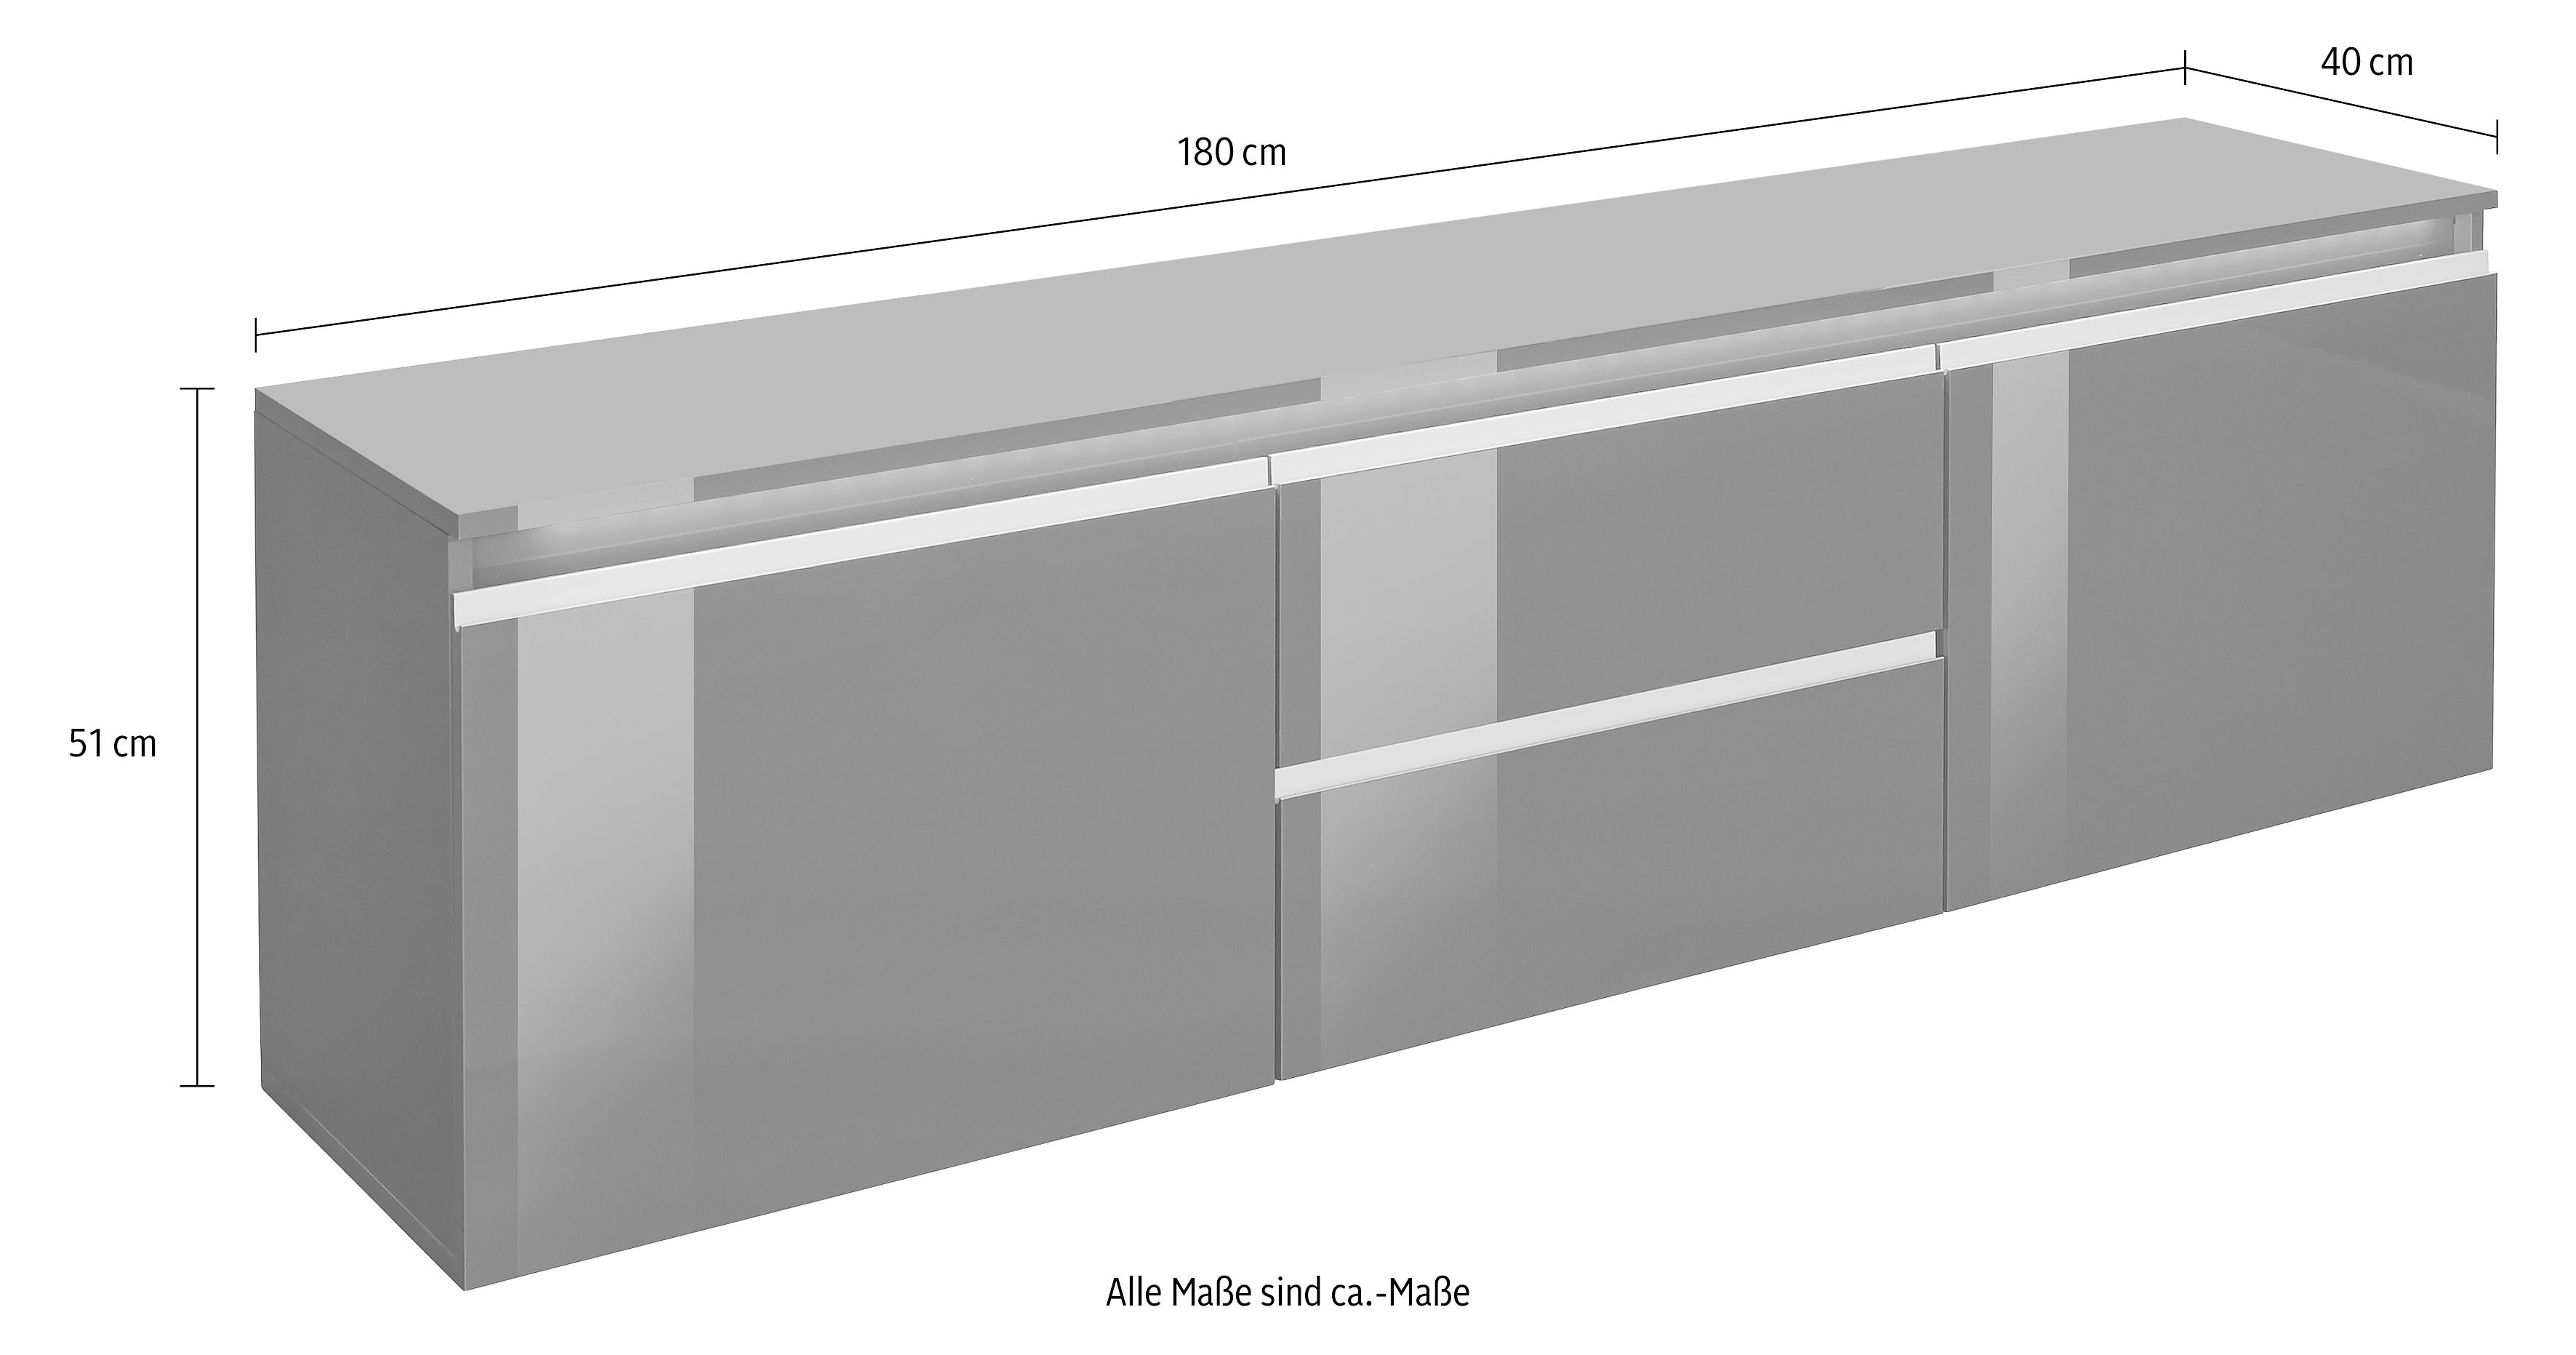 tecnos lowboard breedte 180 cm makkelijk besteld otto. Black Bedroom Furniture Sets. Home Design Ideas